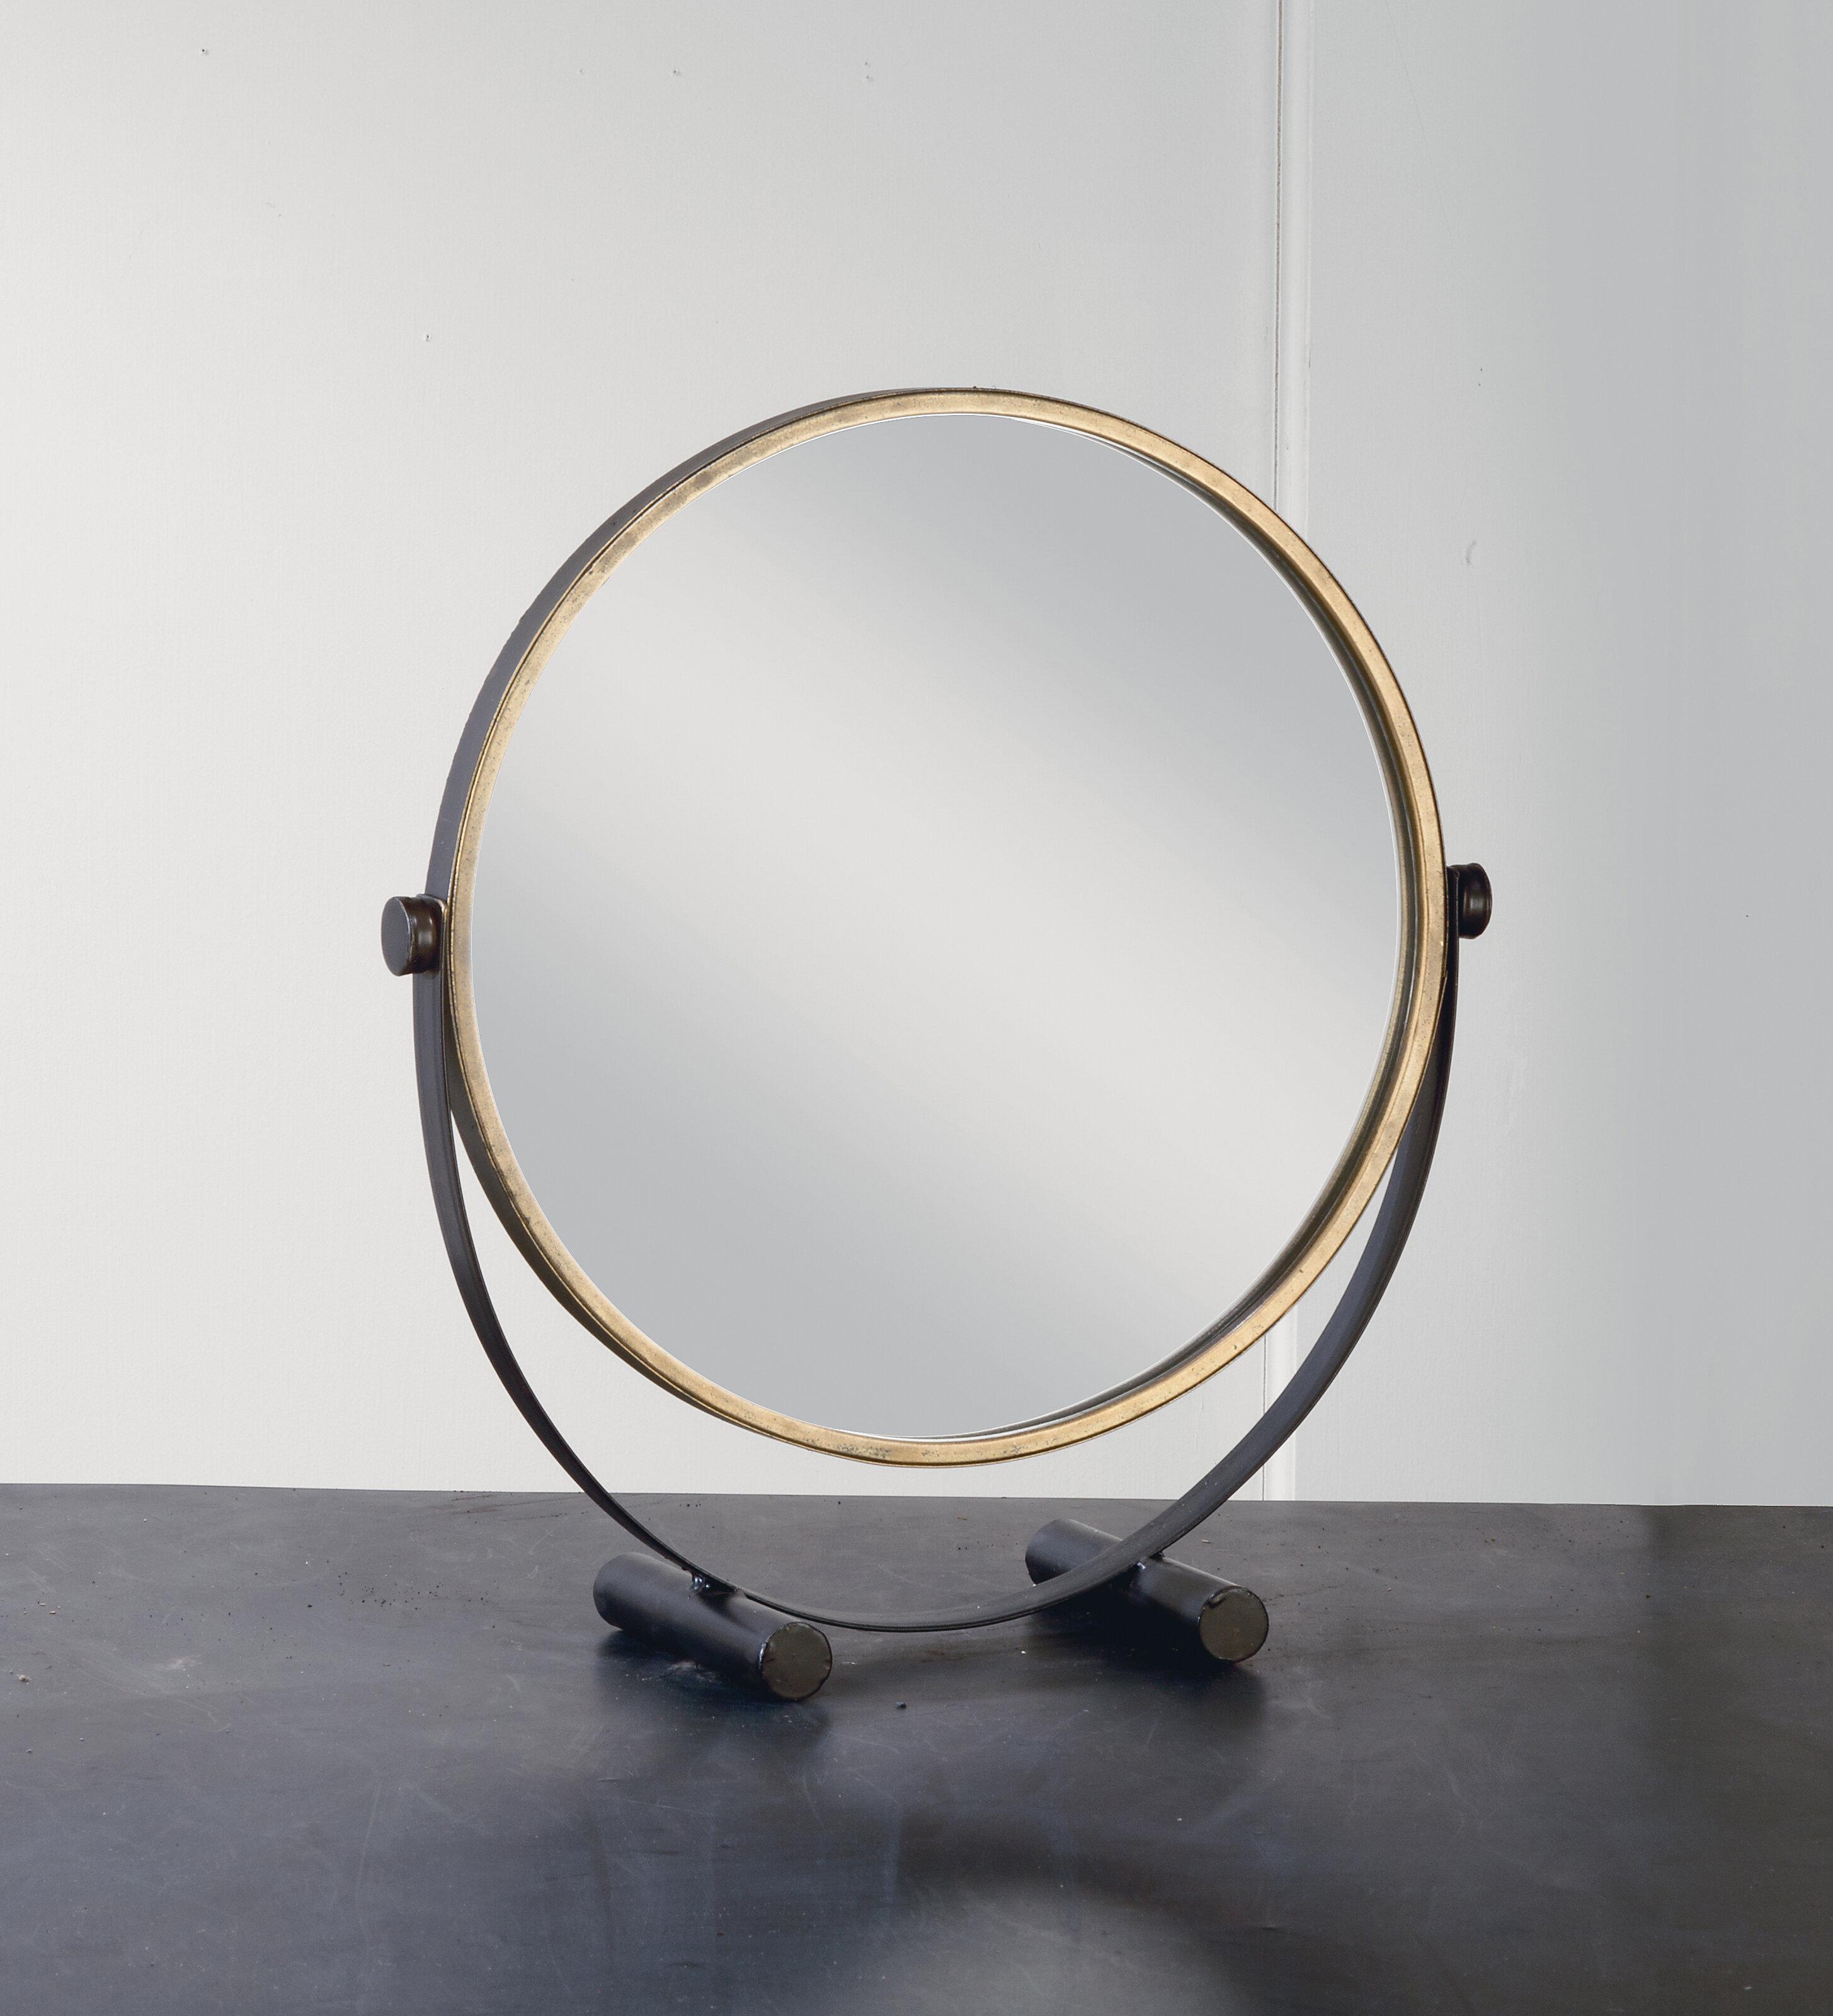 Hein Round Adjustable Rustic Makeup Mirror